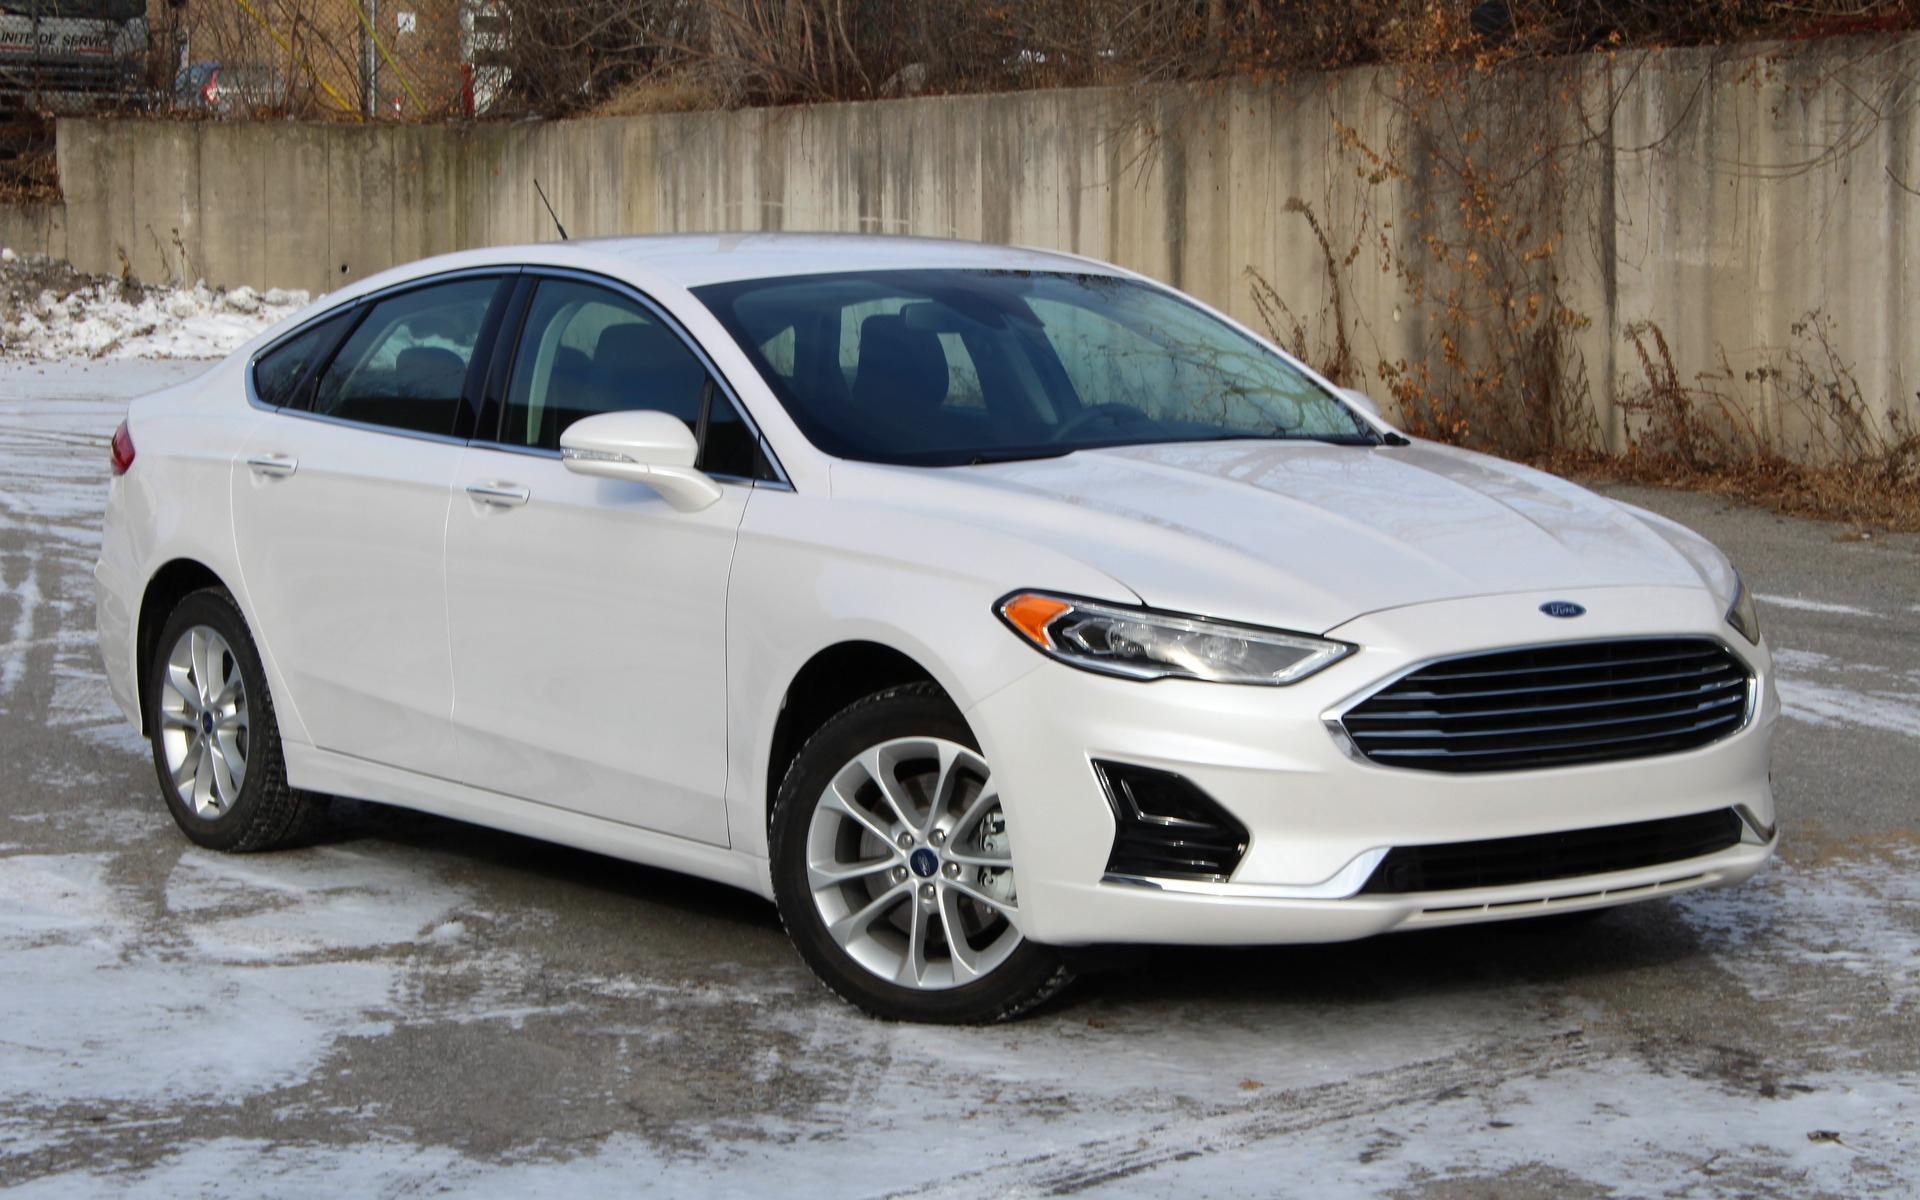 Ford Fusion Energi 2019 : Débranchement Imminent - Guide Auto